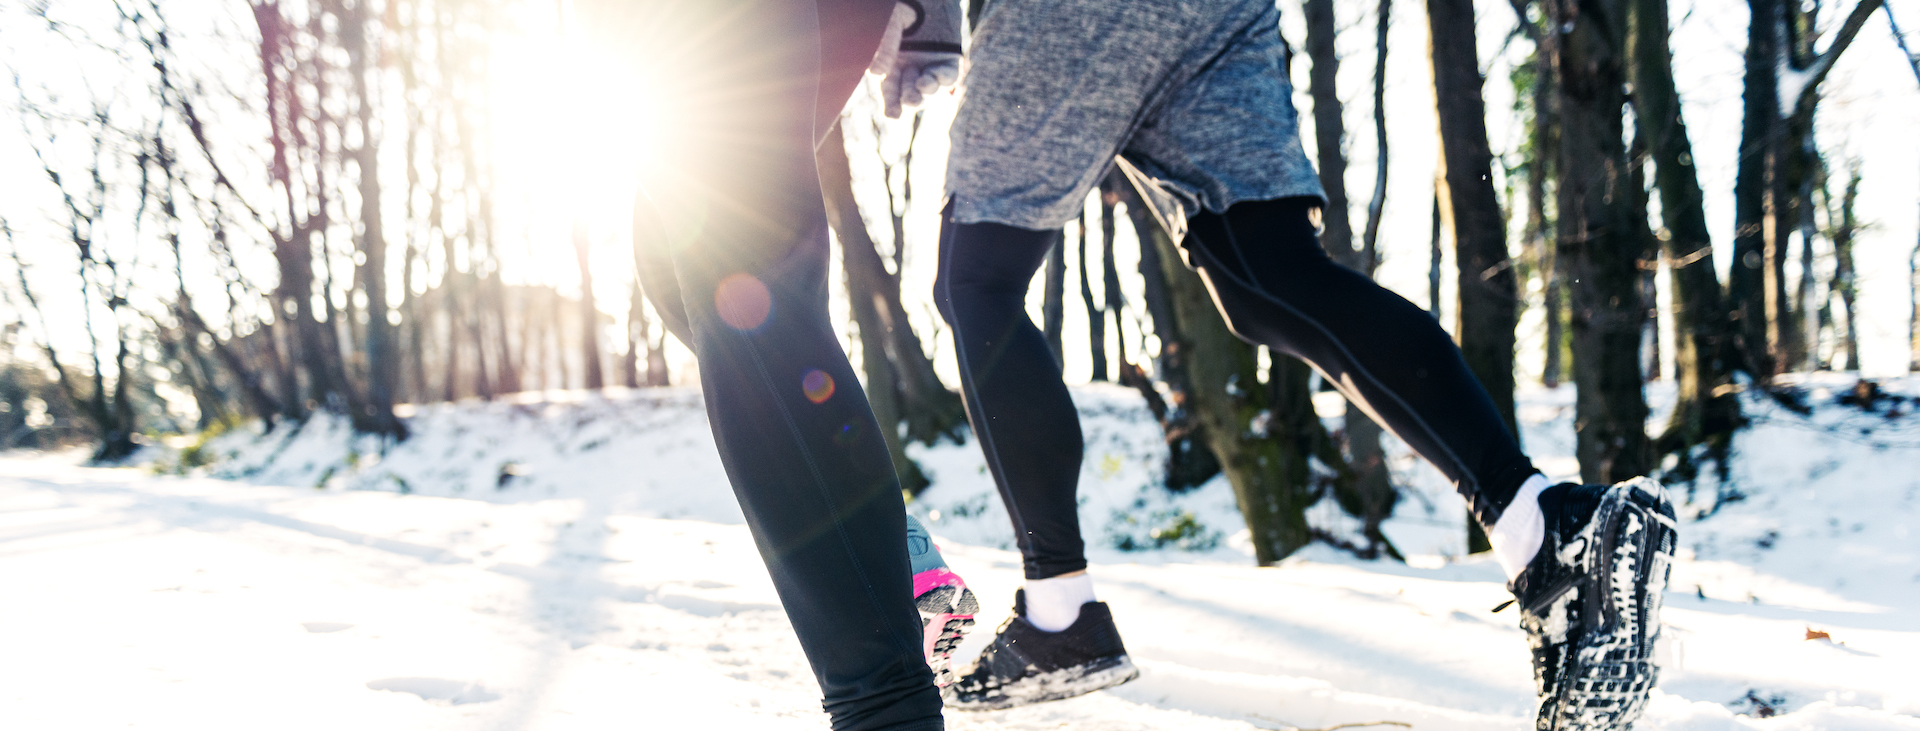 Feet running in the snow